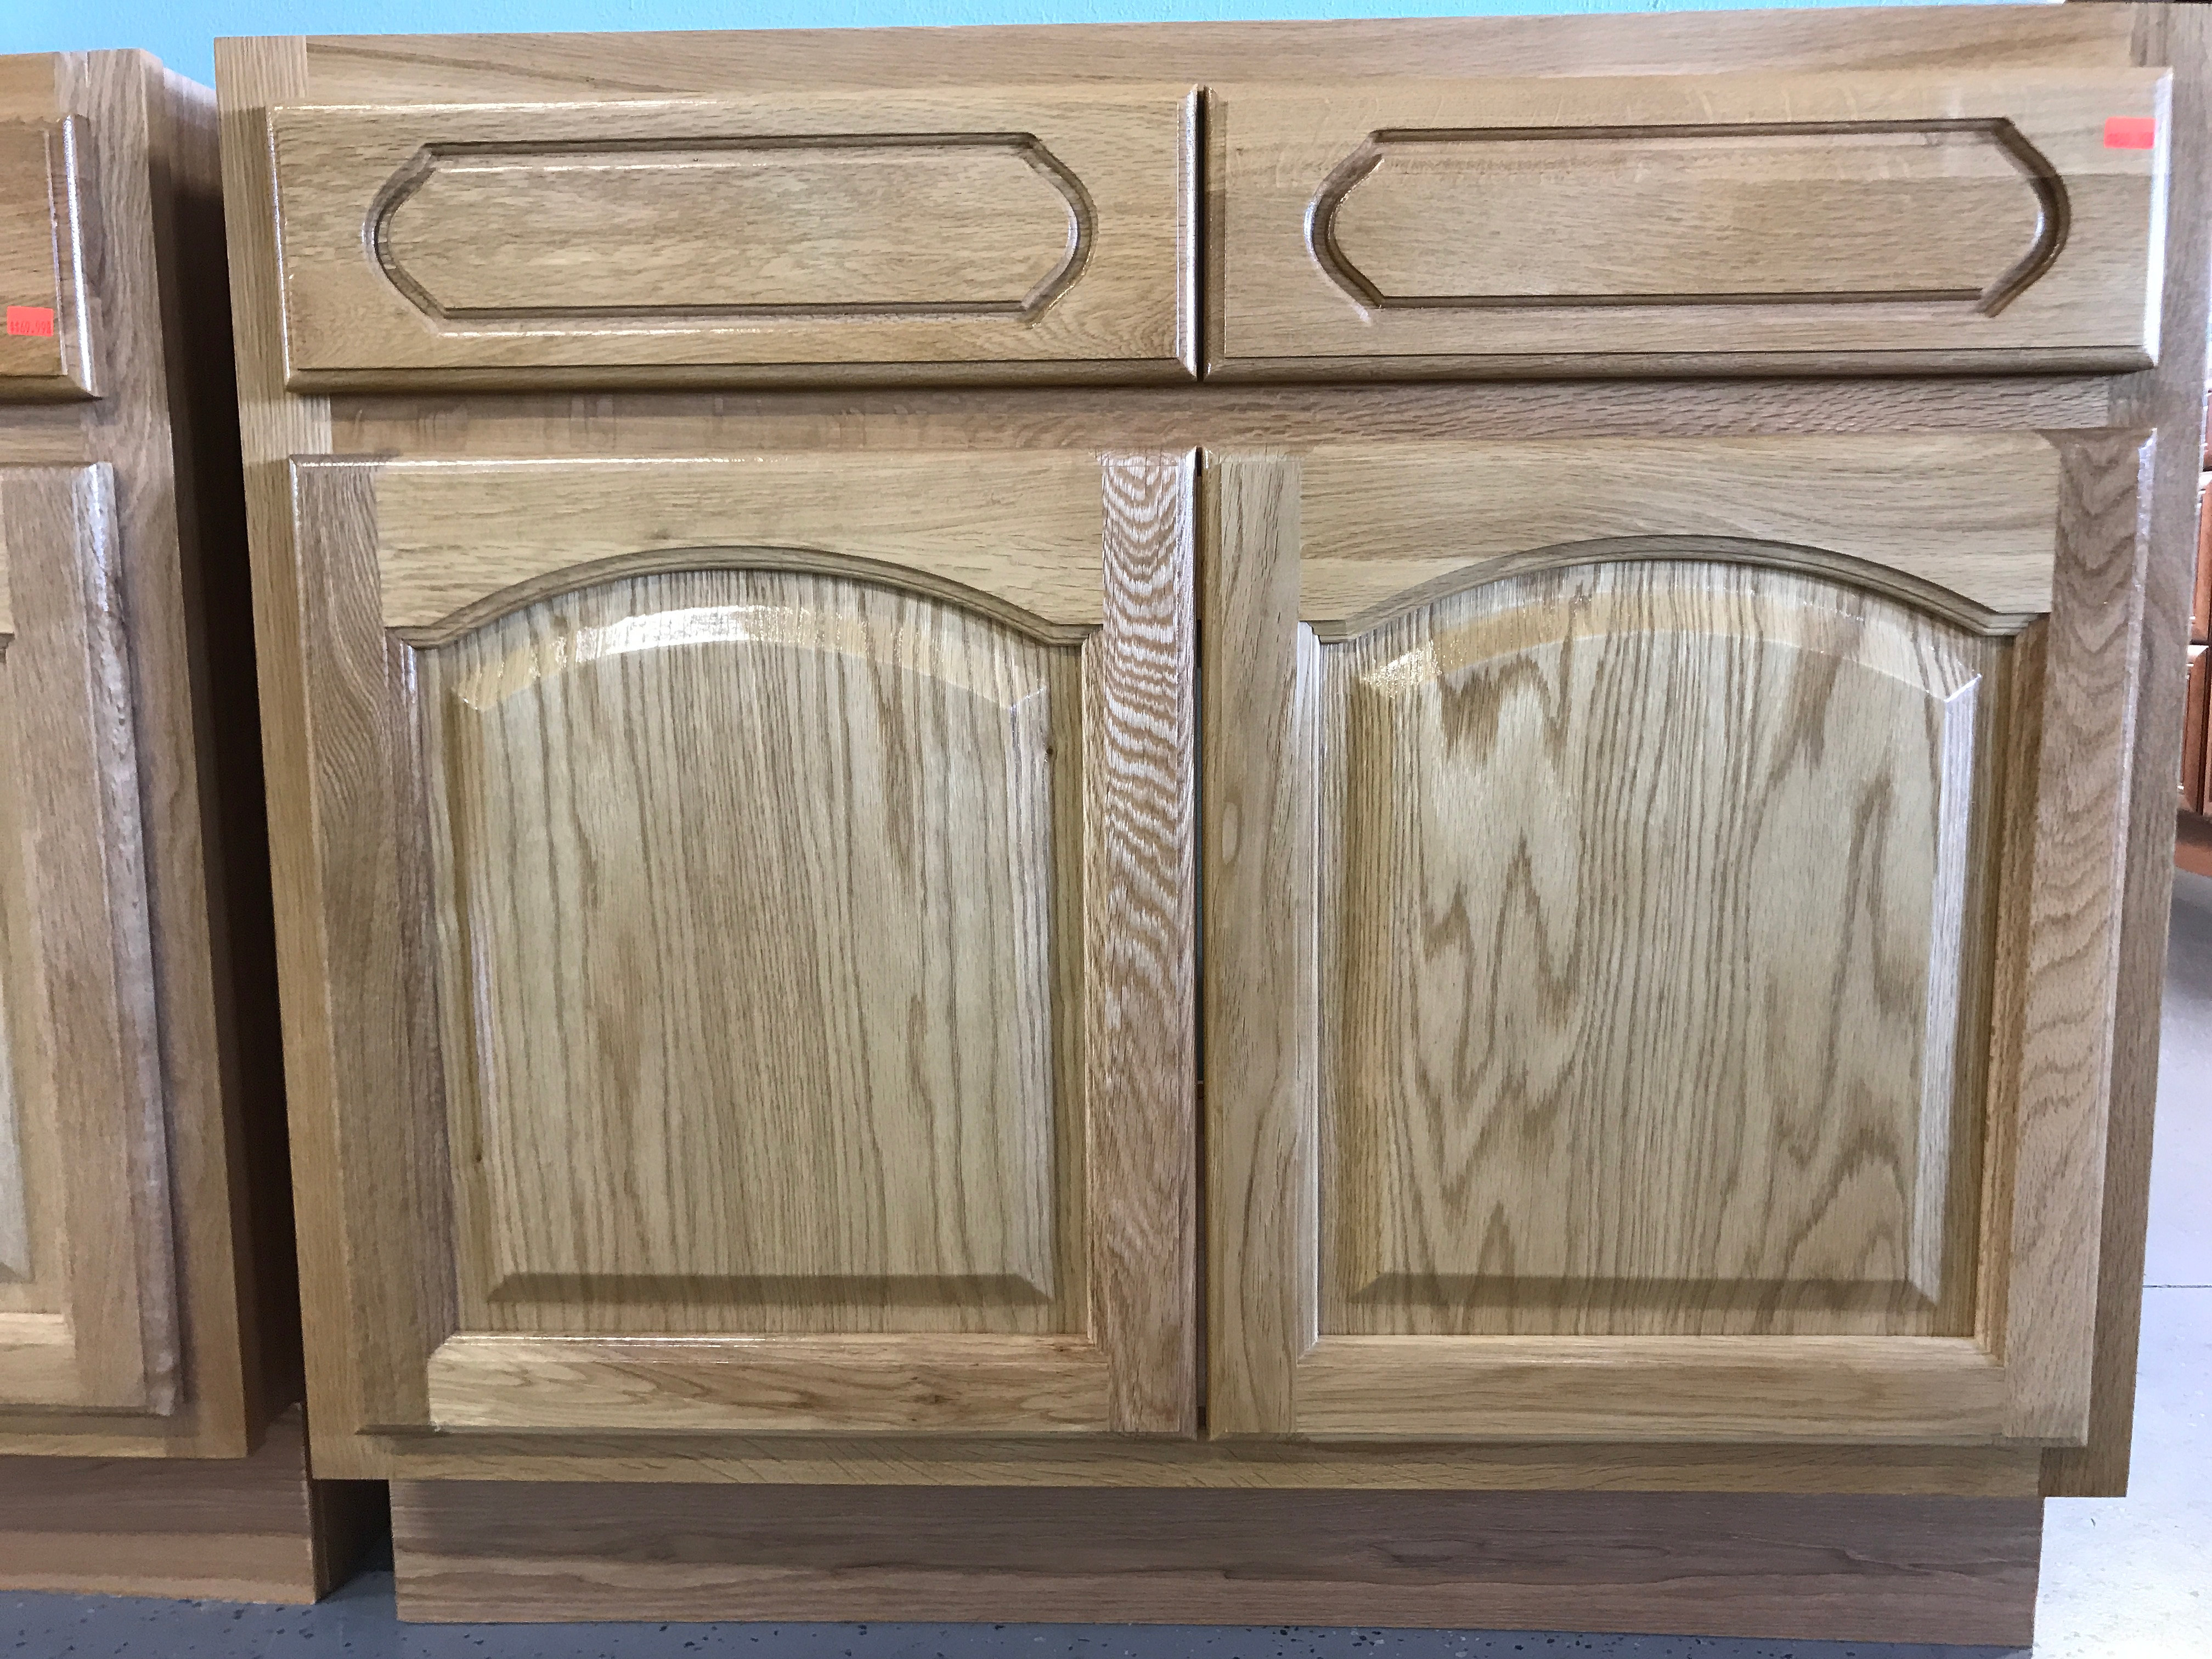 Kitchen Cabinets Melbourne Fl 321 Cabinets Kitchen Cabinets Melbourne Florida Img 3058